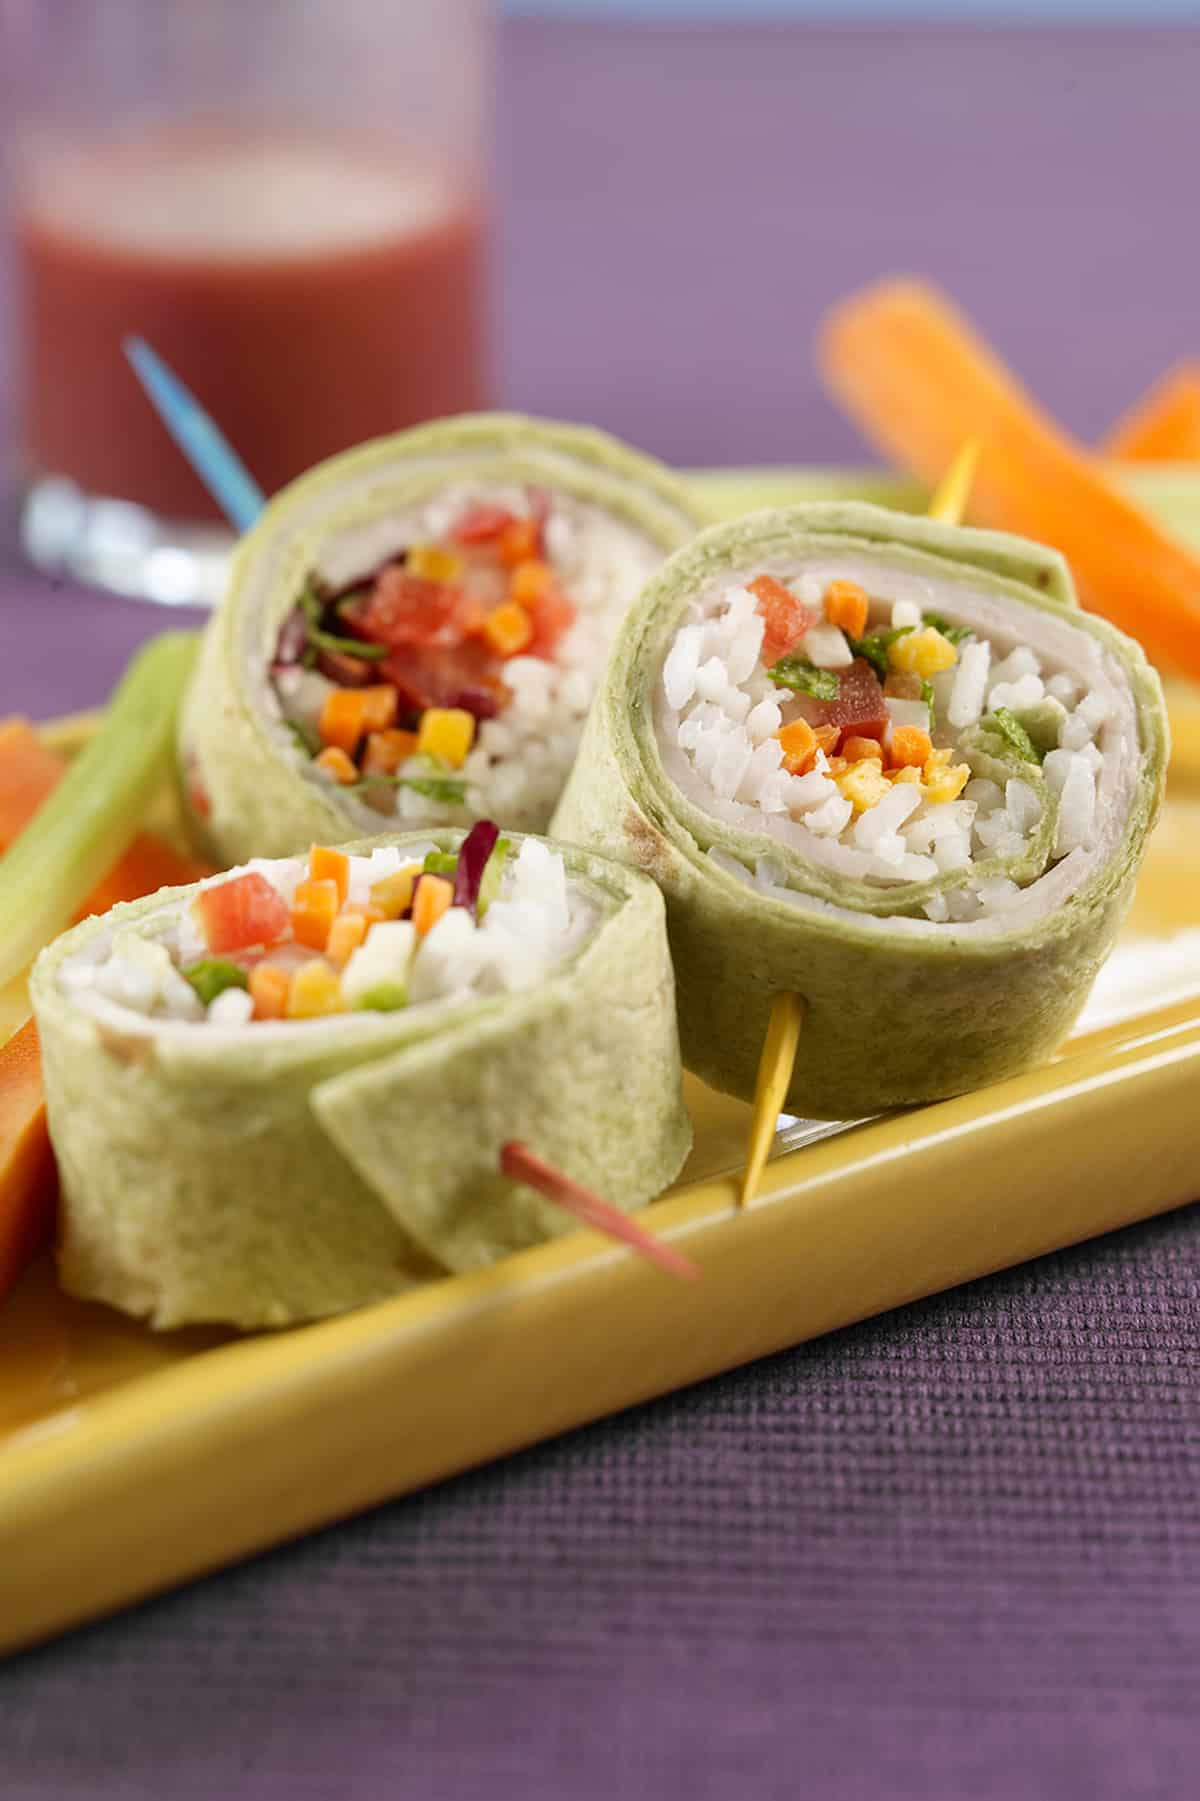 Turkey Sushi Rolls Vertical image close up